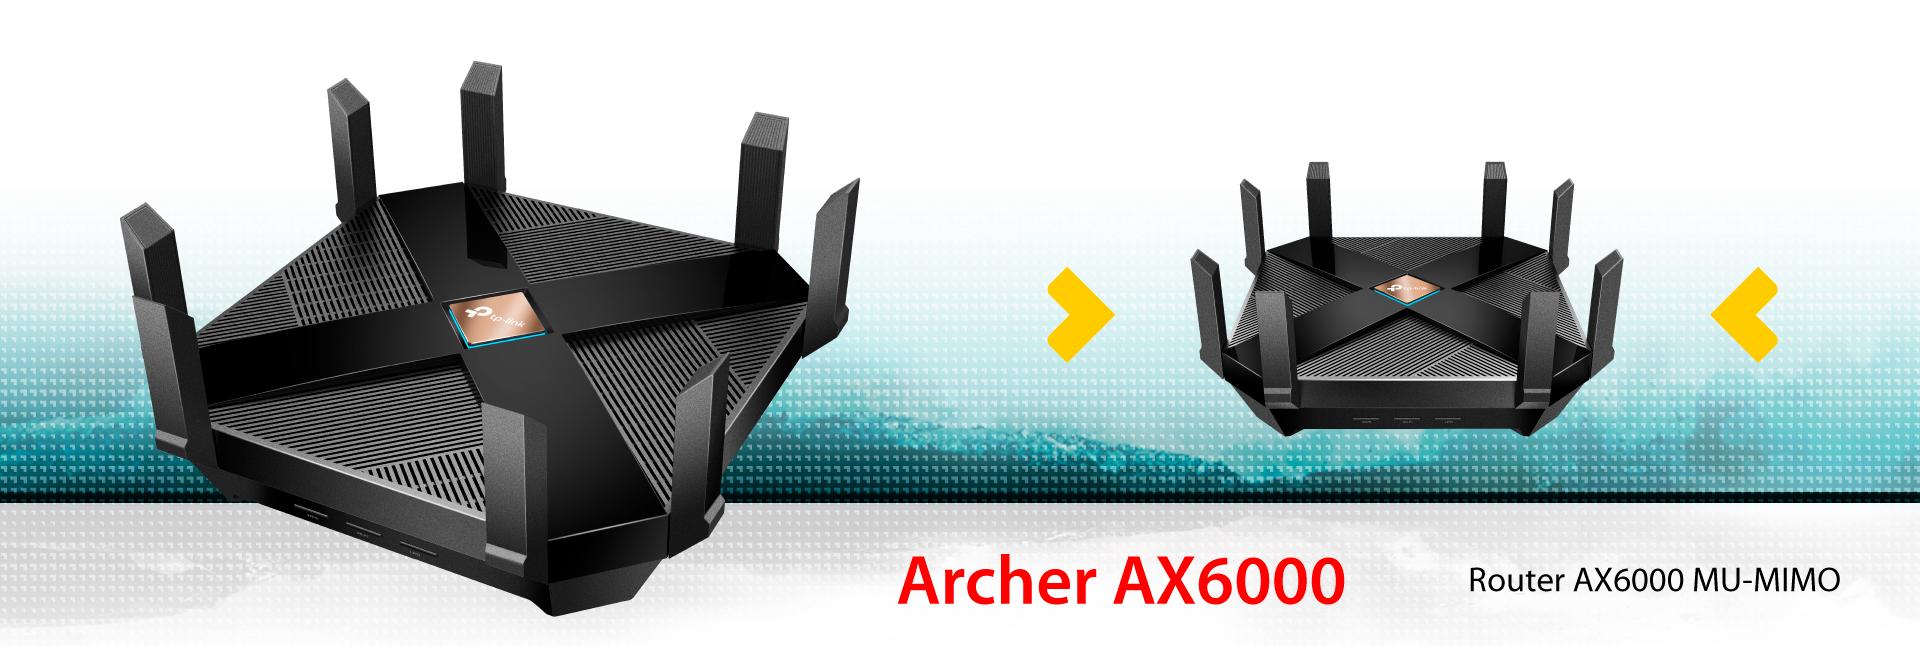 ax6000